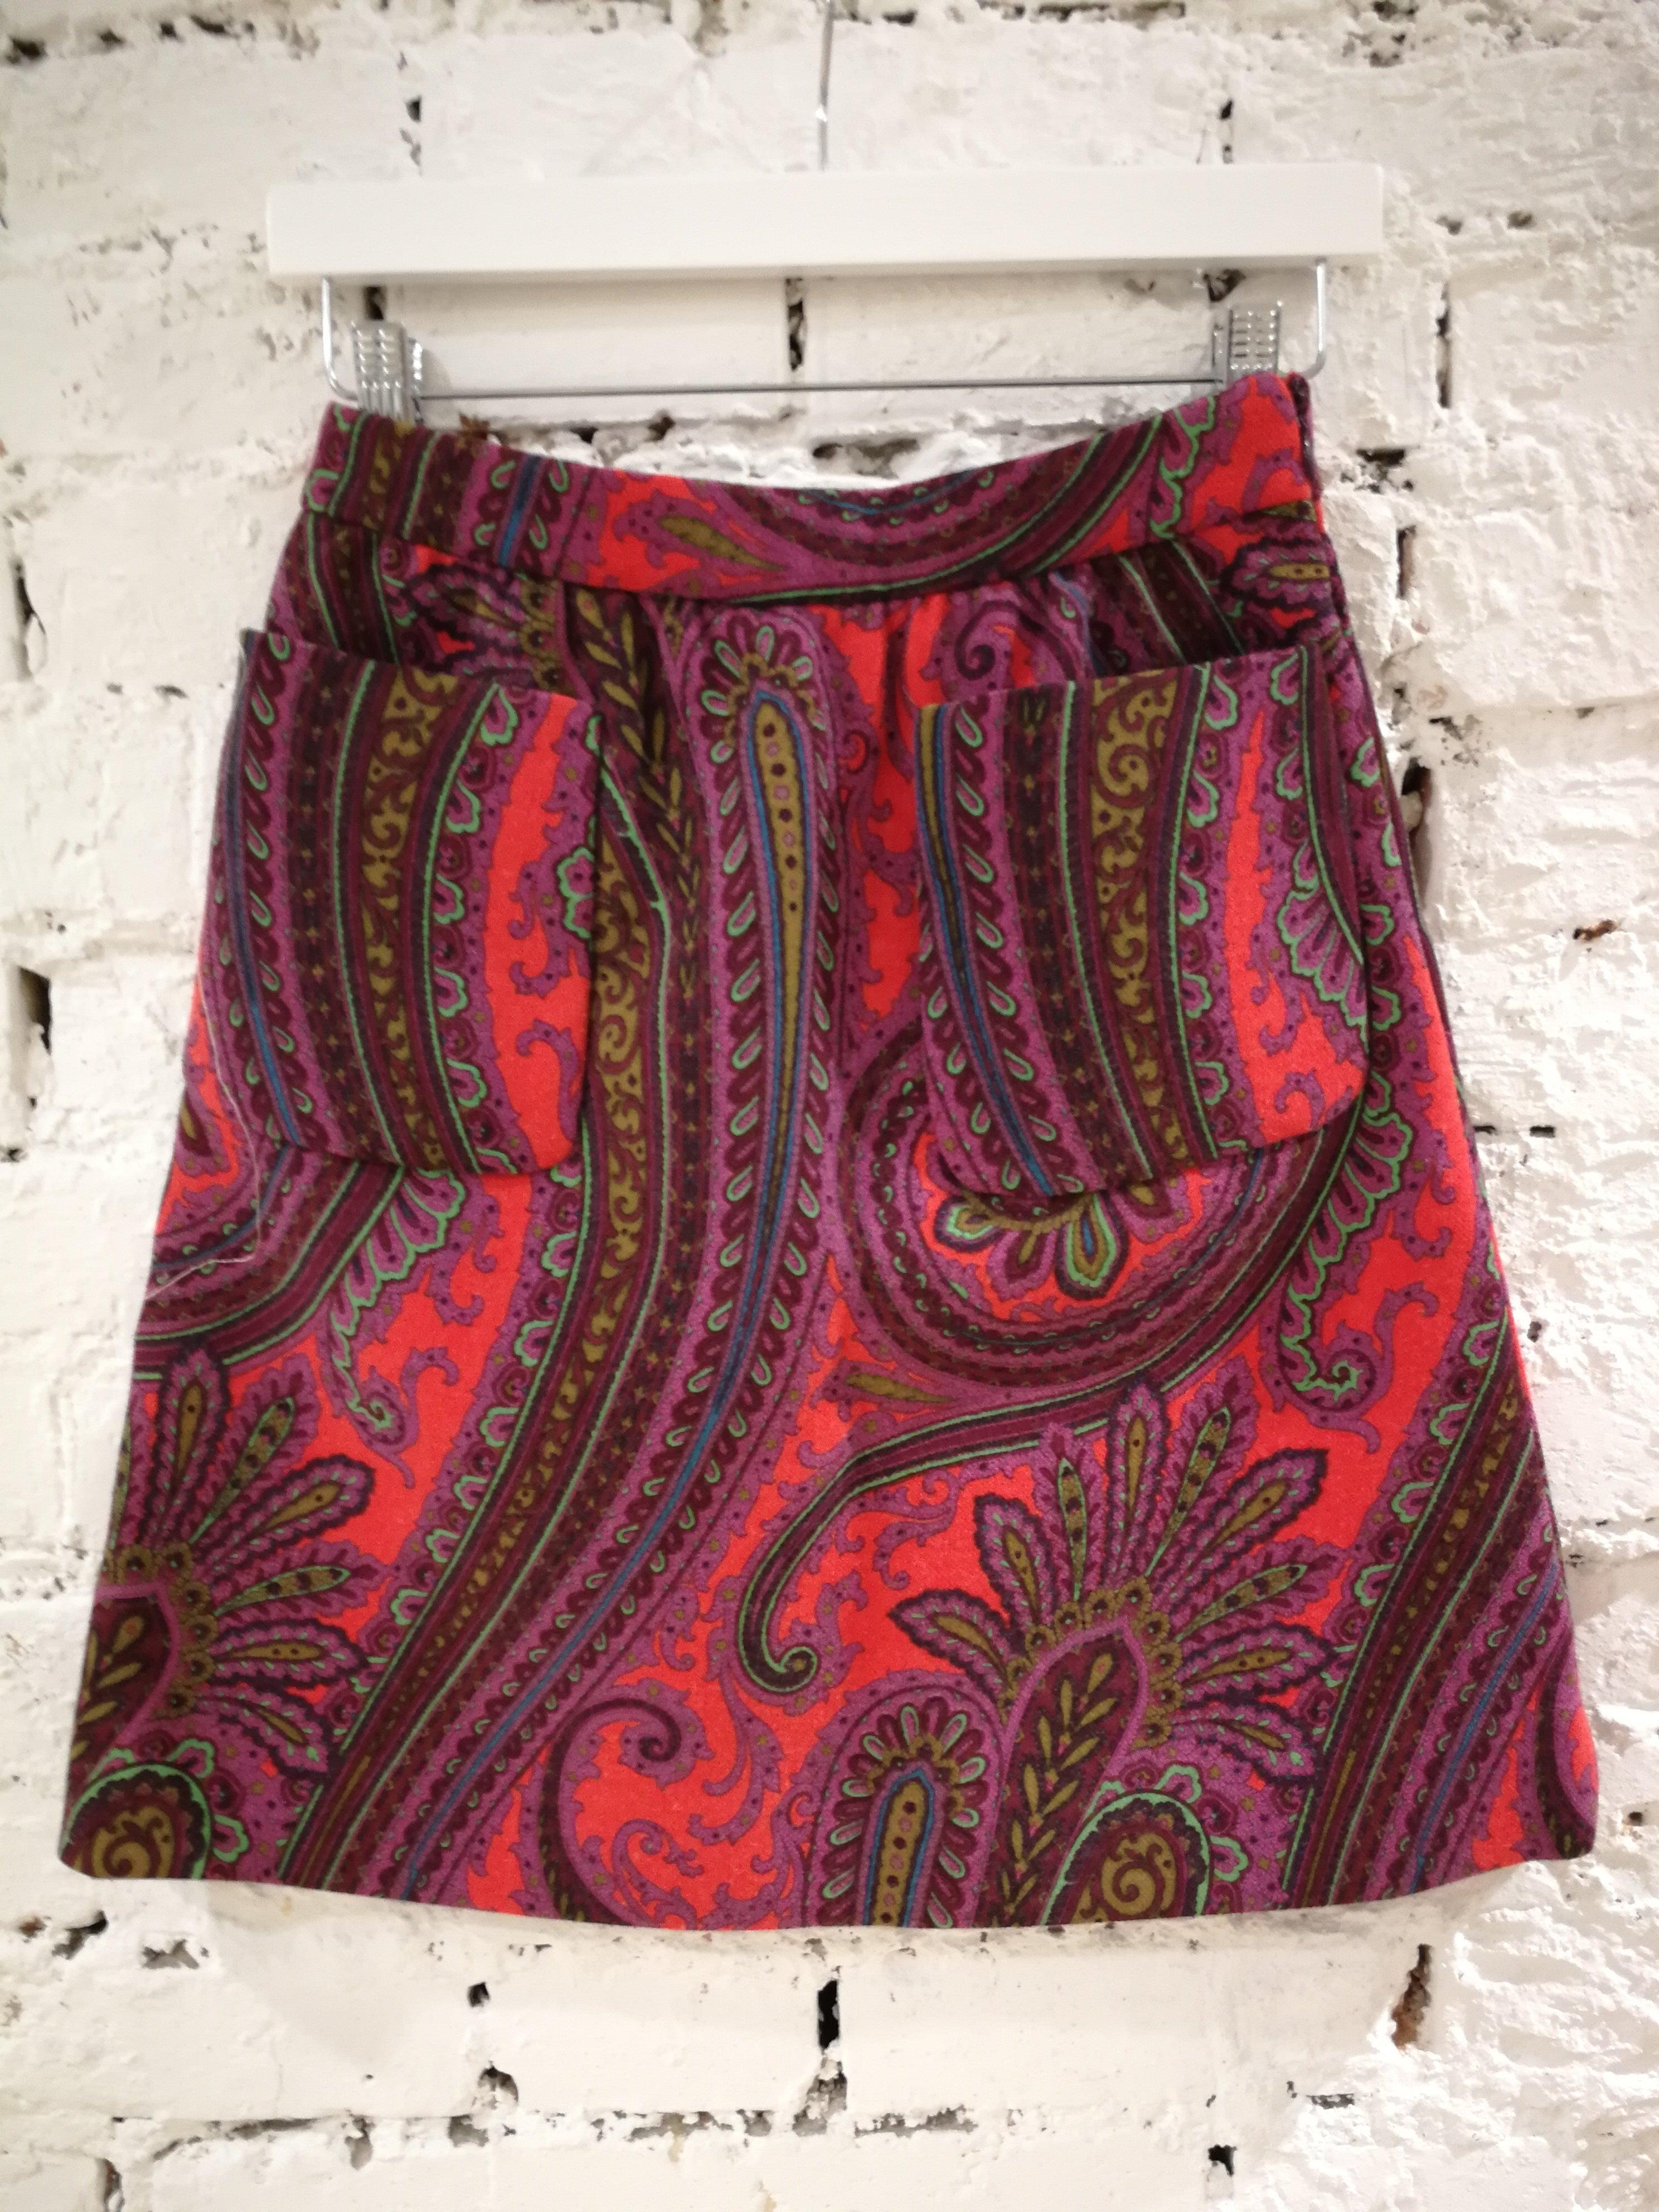 d090acf3d6ab Miu Miu multicoloured Wool Skirt at 1stdibs